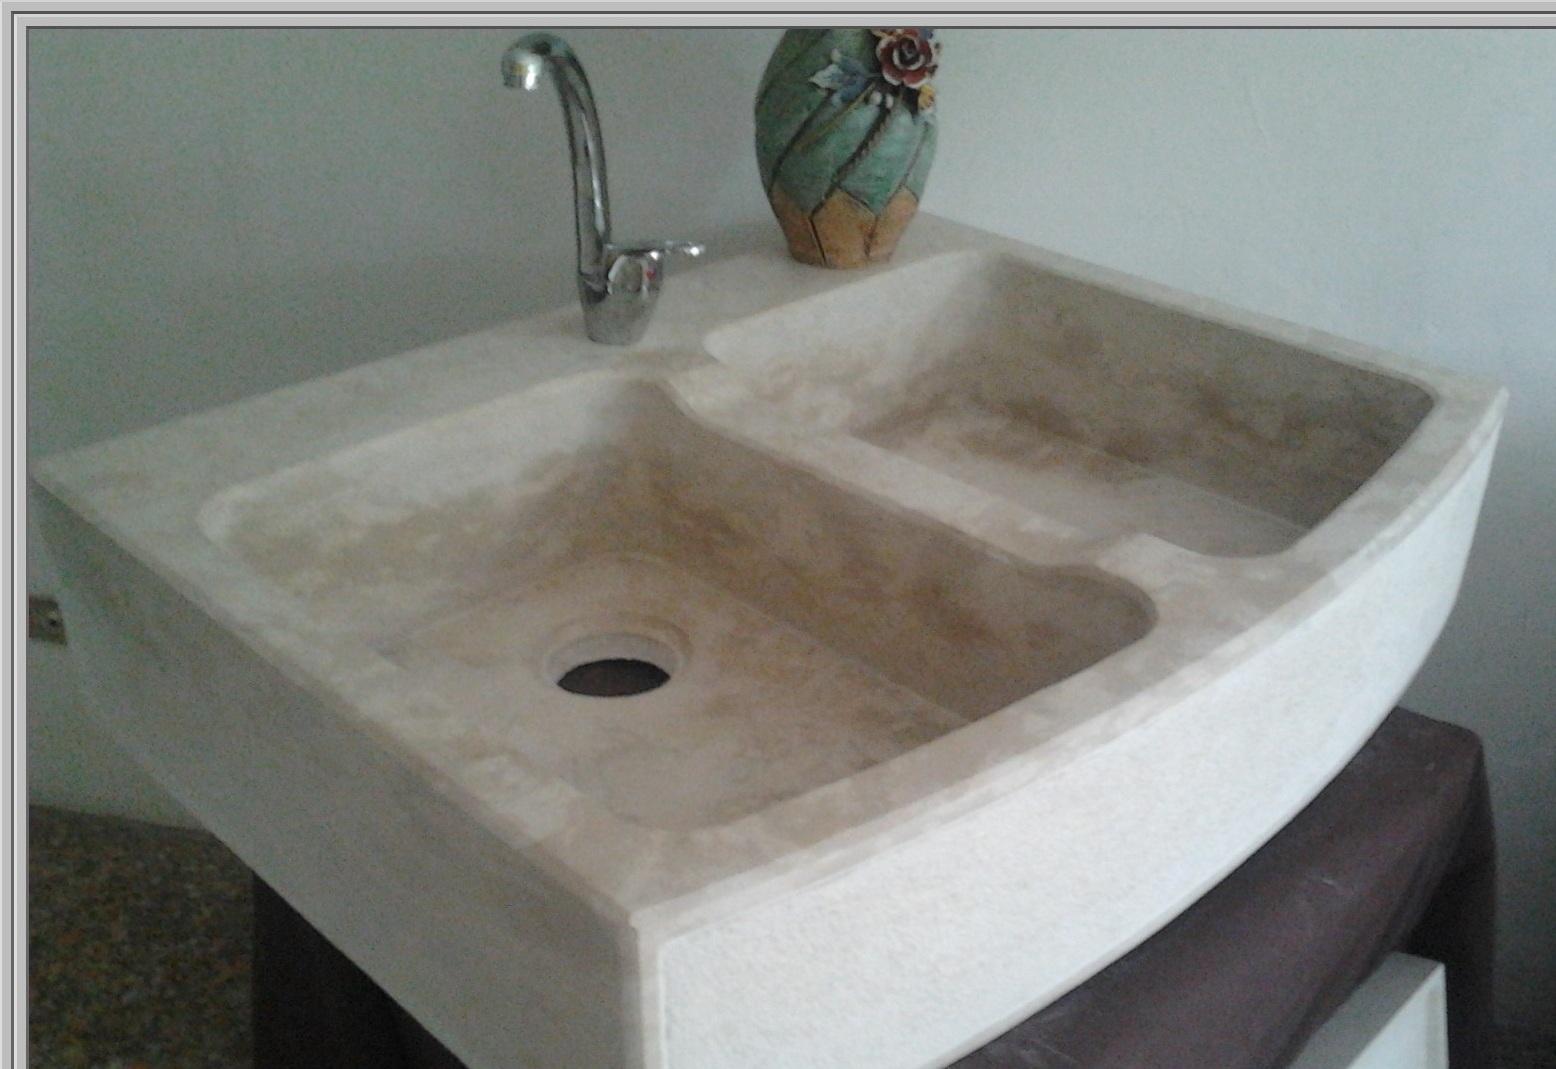 Ebay - Lavandini in marmo per cucina ...